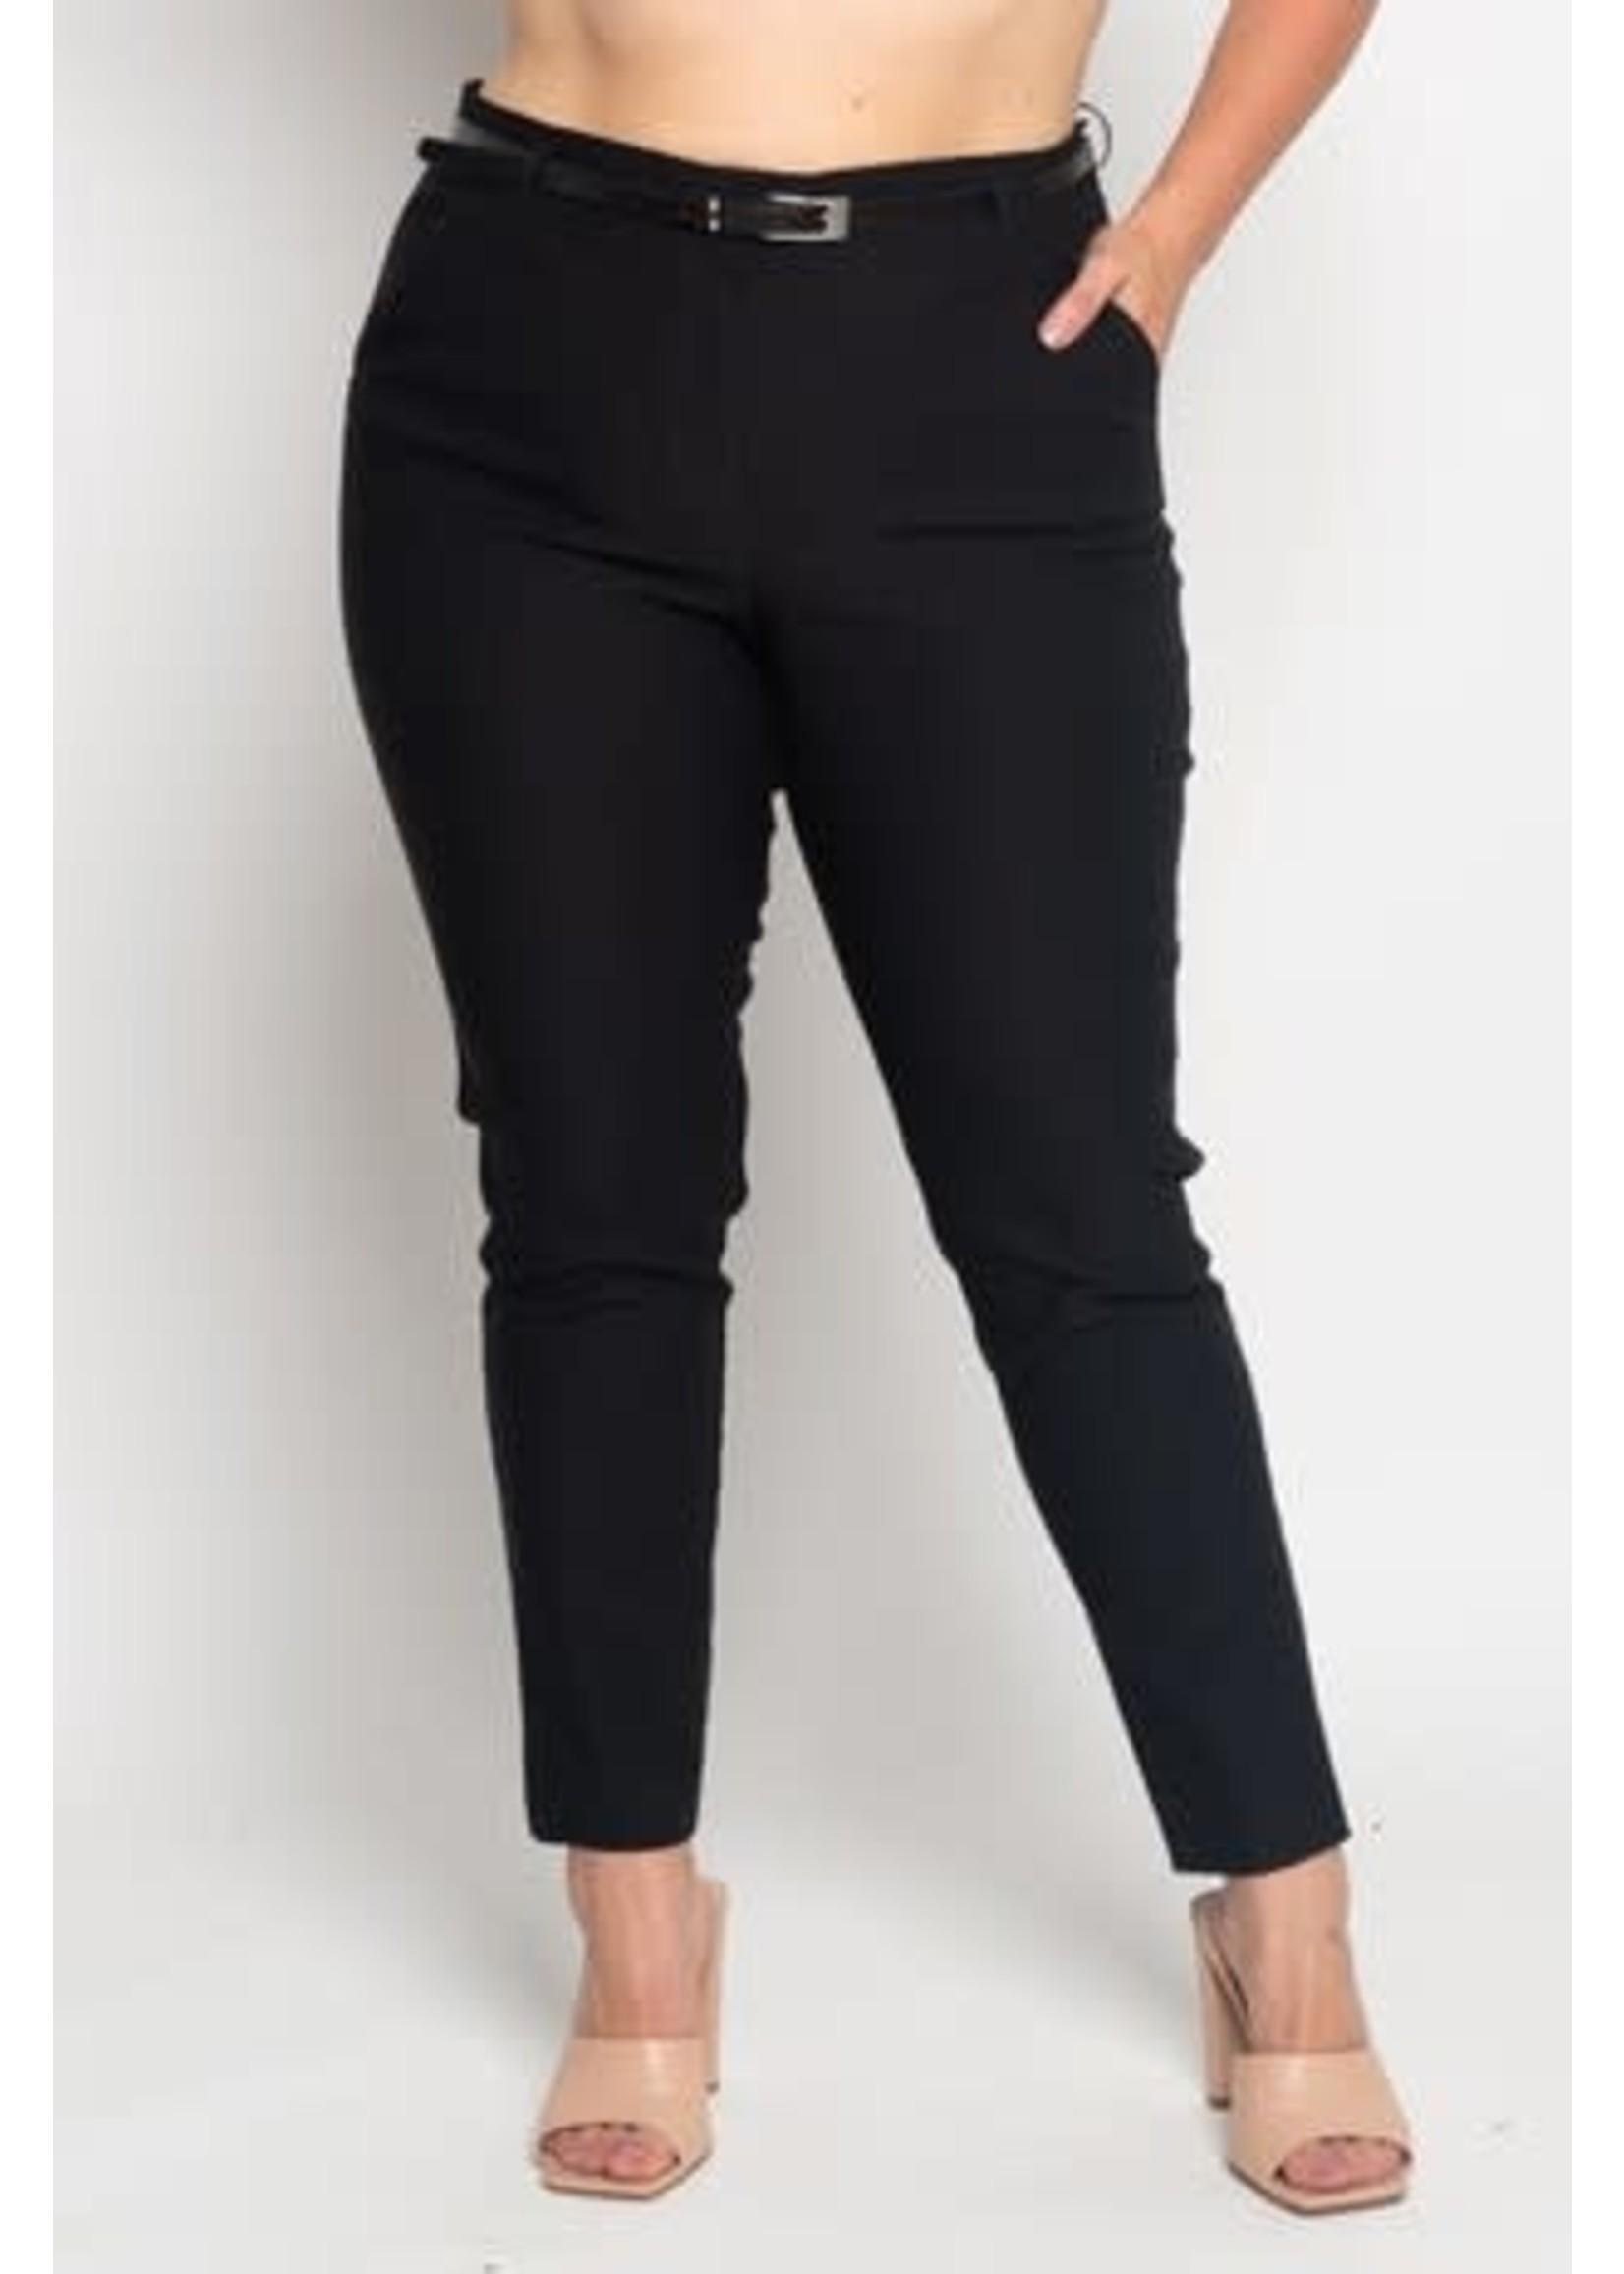 Black Pants-Plus